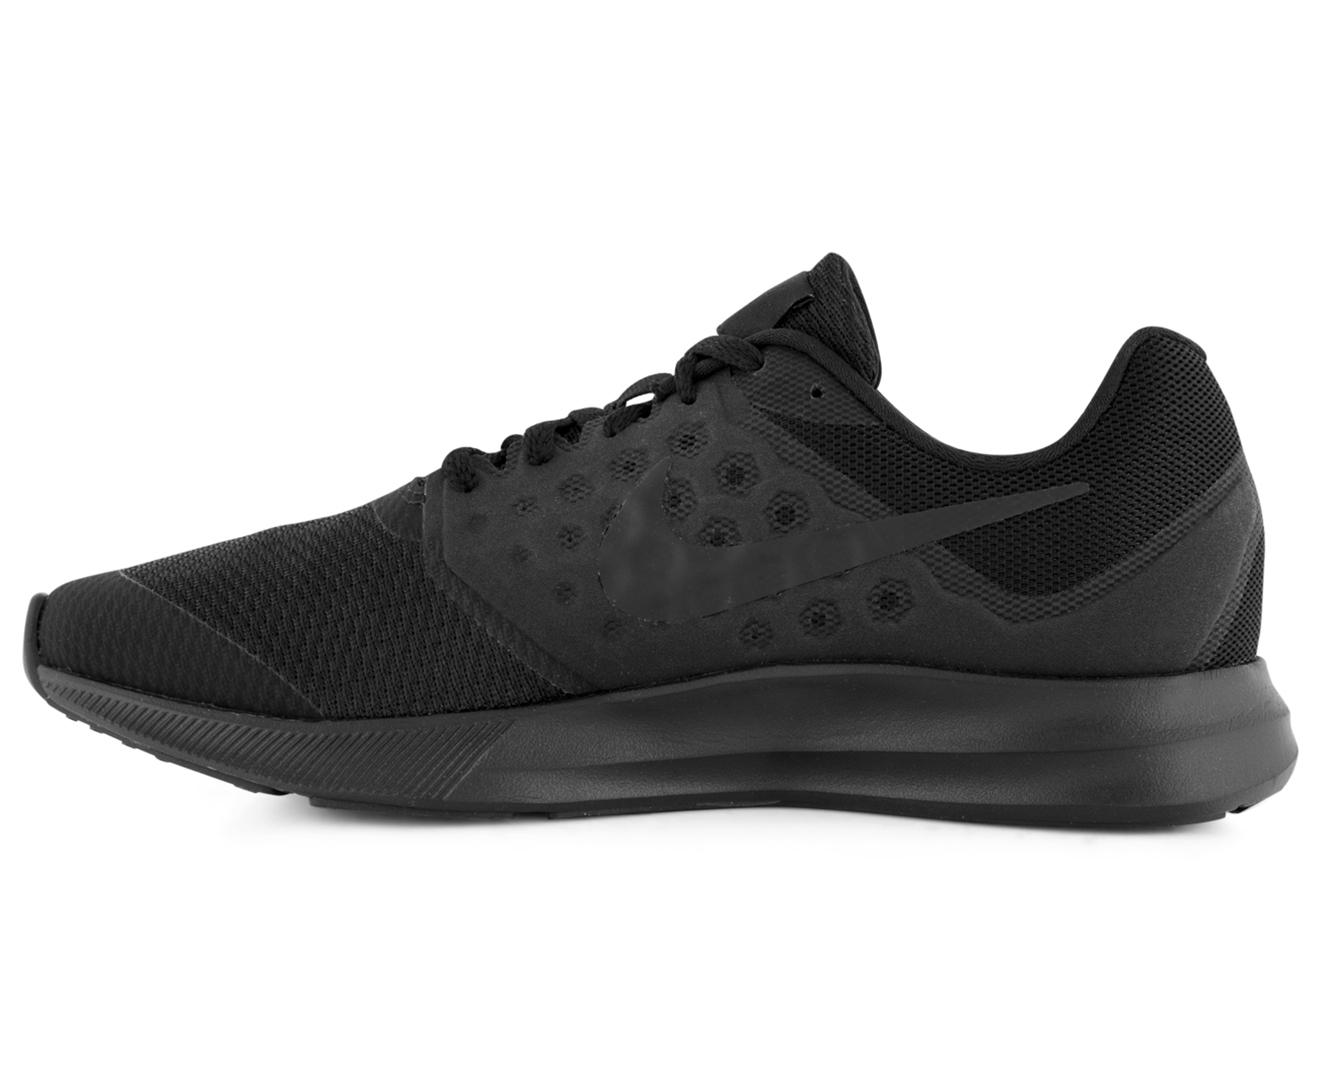 Nike Boys' Grade-School Downshifter 7 Shoe - Black/Black